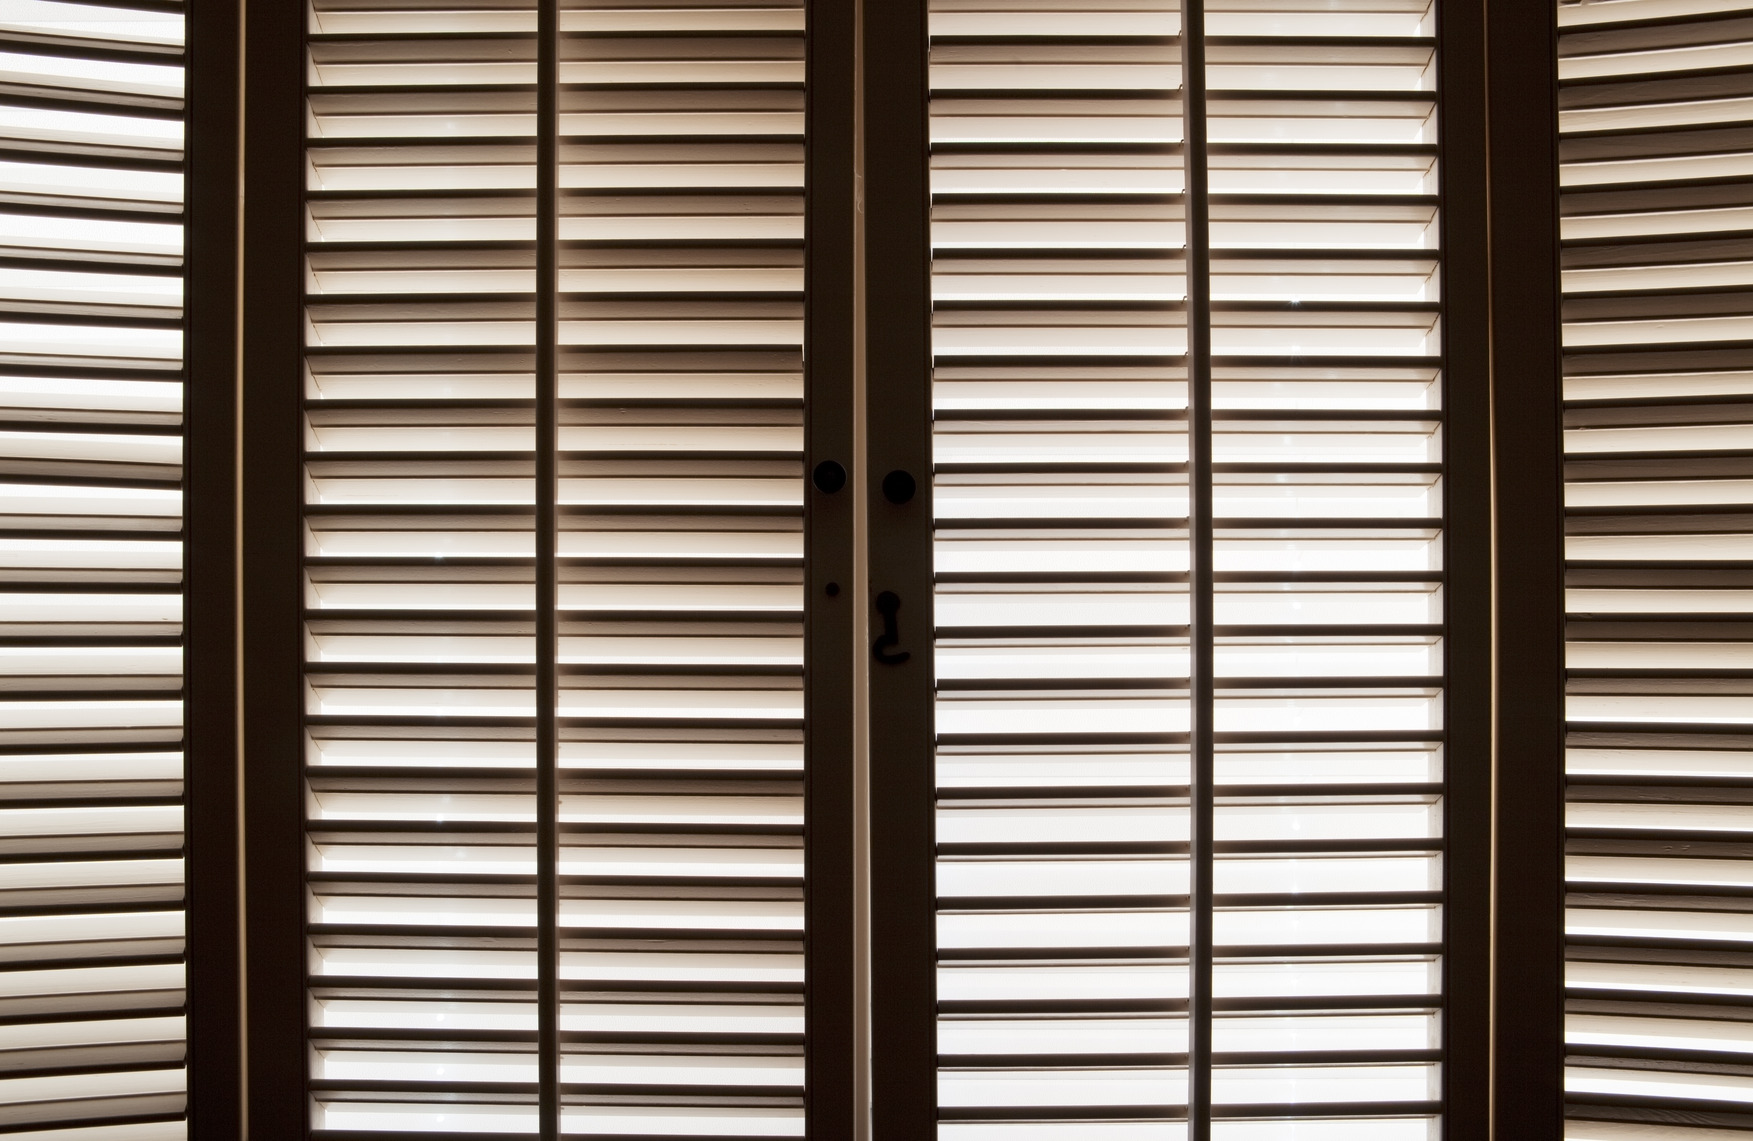 photodune-1479091-wooden-window-shutters-m